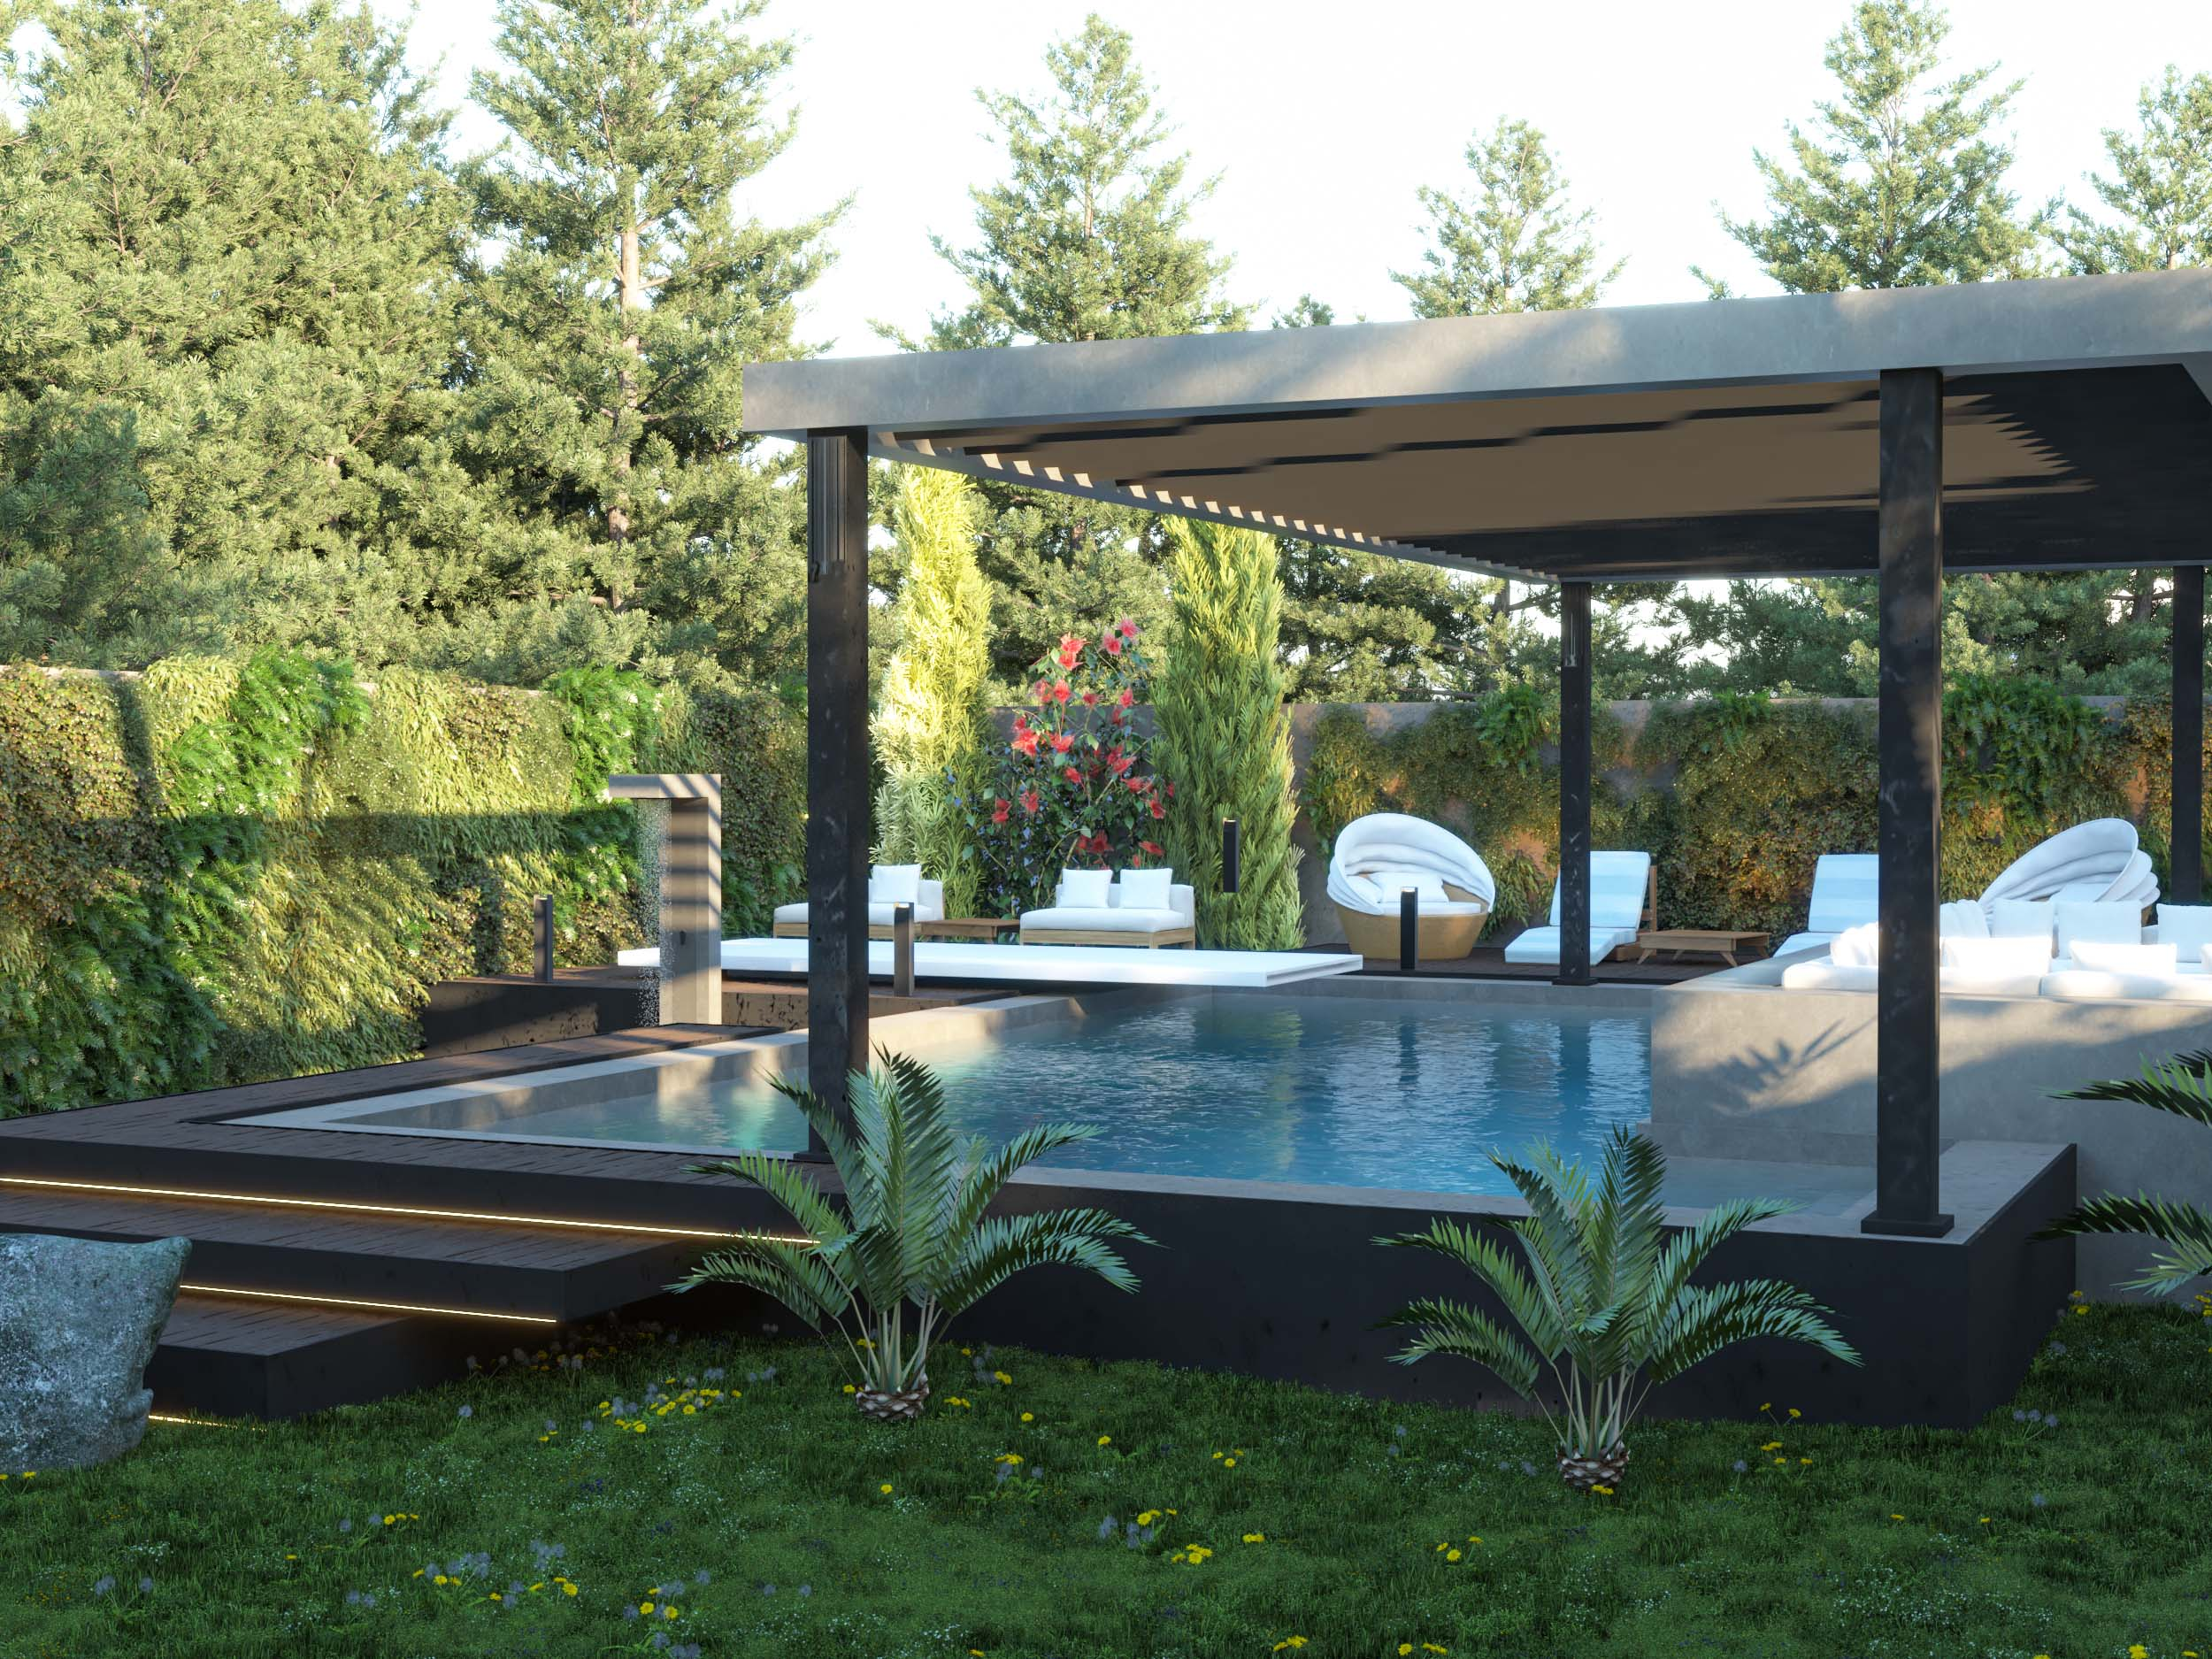 SWIMMING POOL AREA DESIGN- shower area - shower - swimming pool - garden